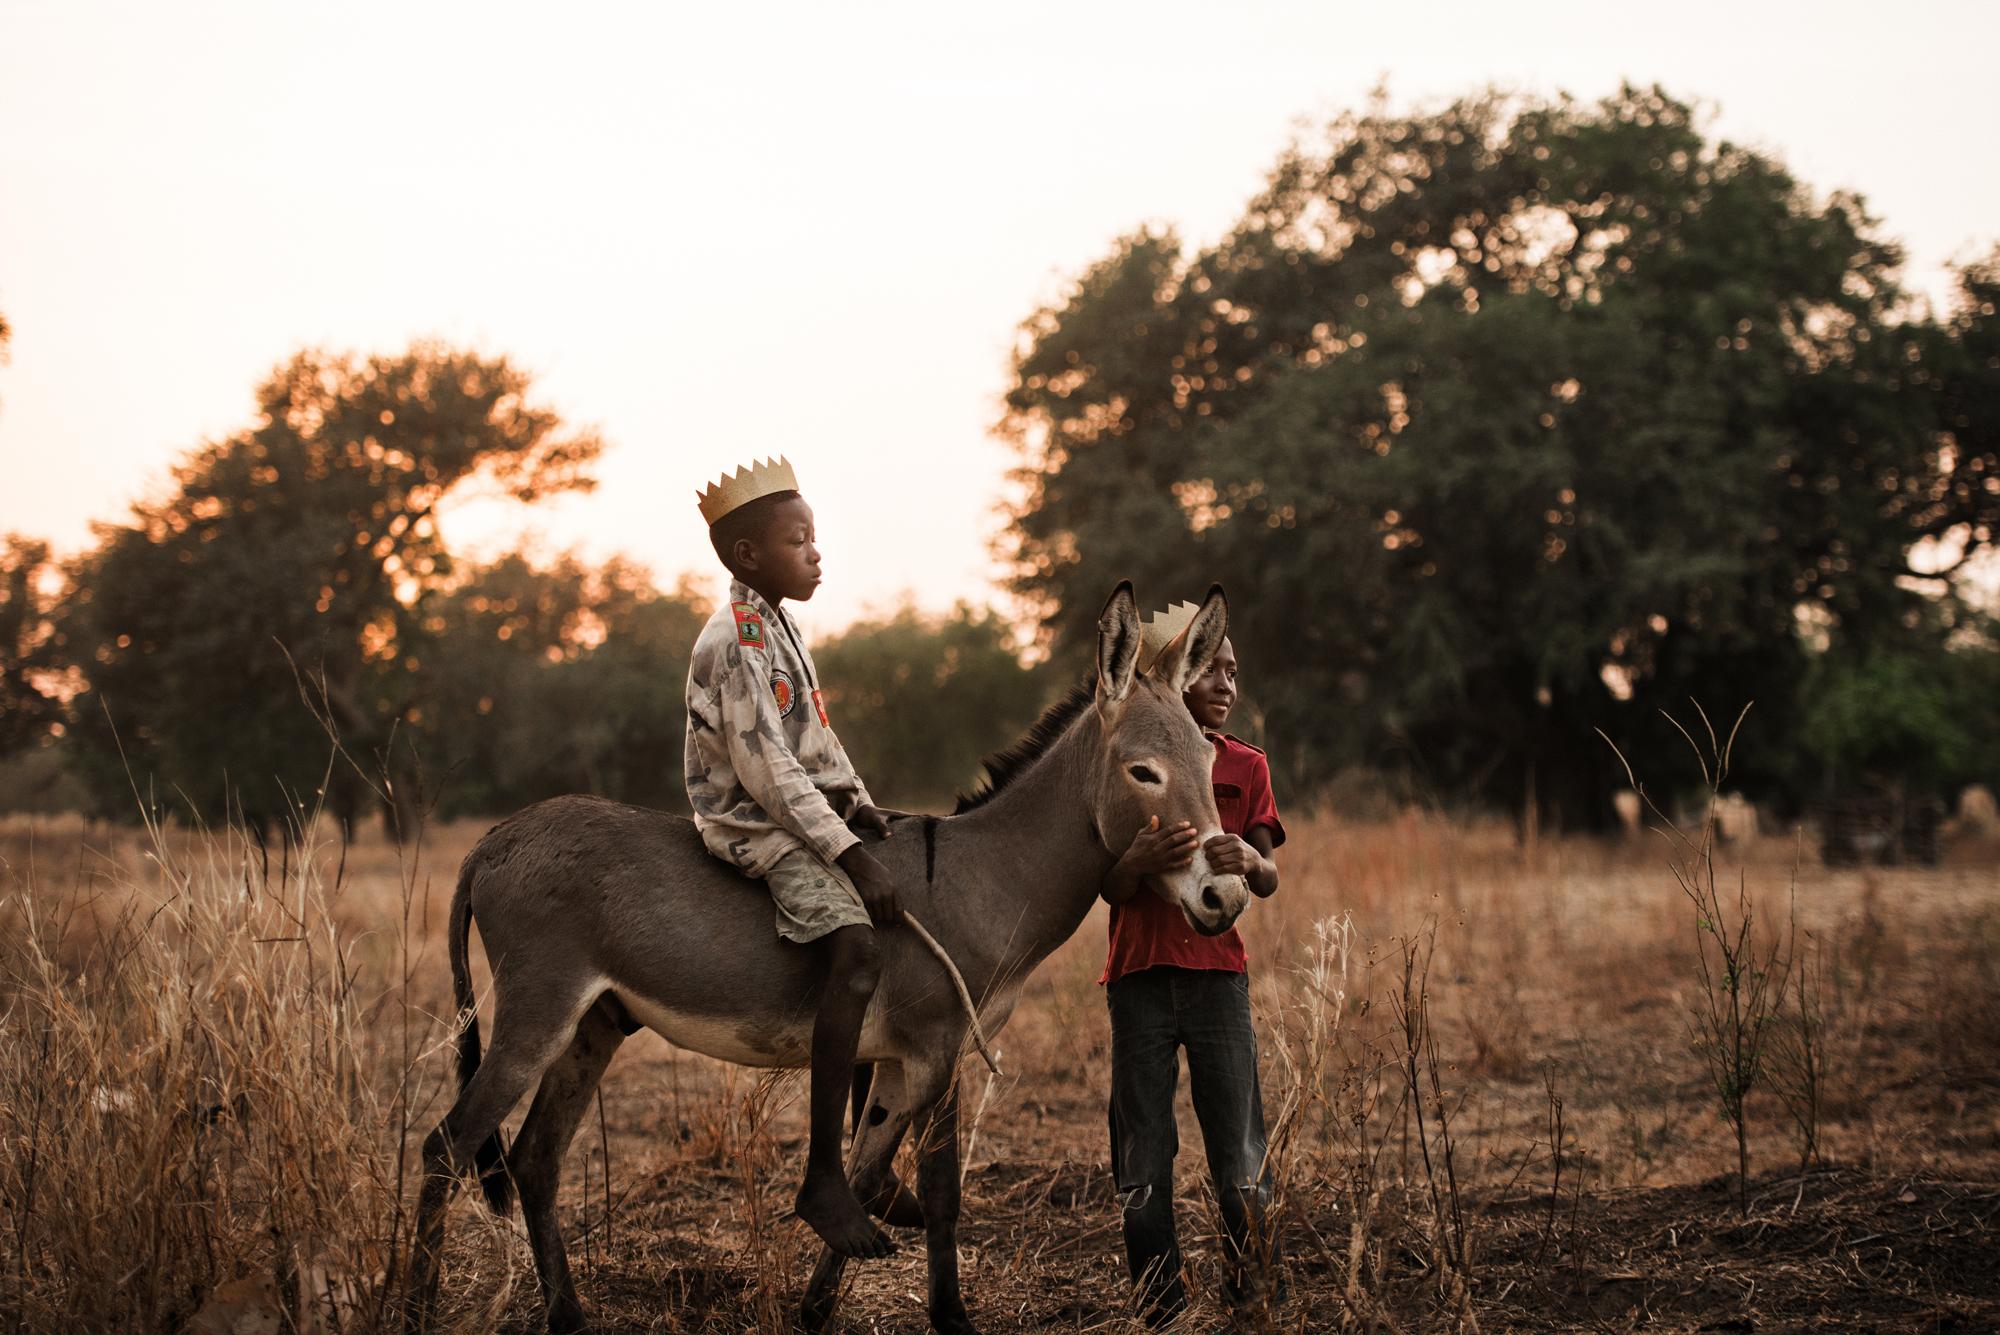 EMBR_Ghana_Africa_Humanitarian_Photographer_TaraShupe_167-FINAL.jpg